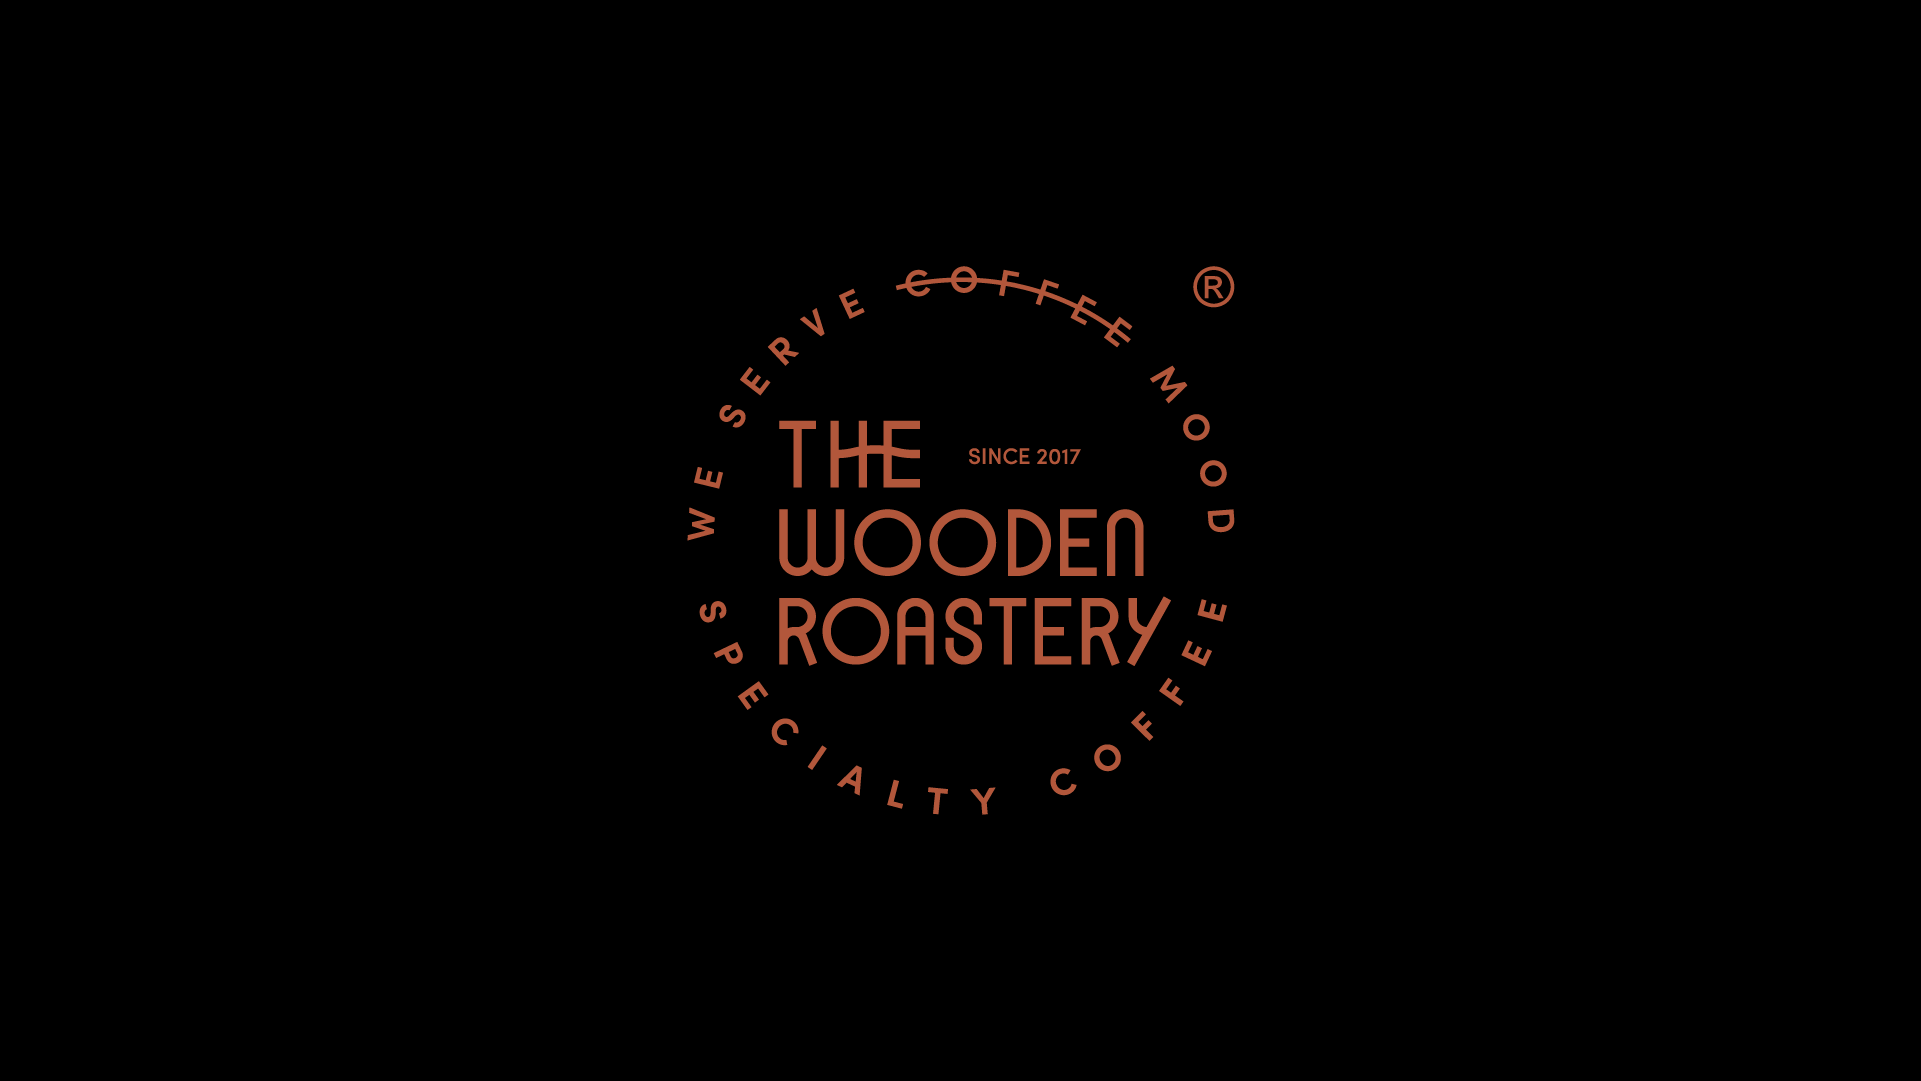 Logo-WoodenCoffee-Work-by-YaStudio-21